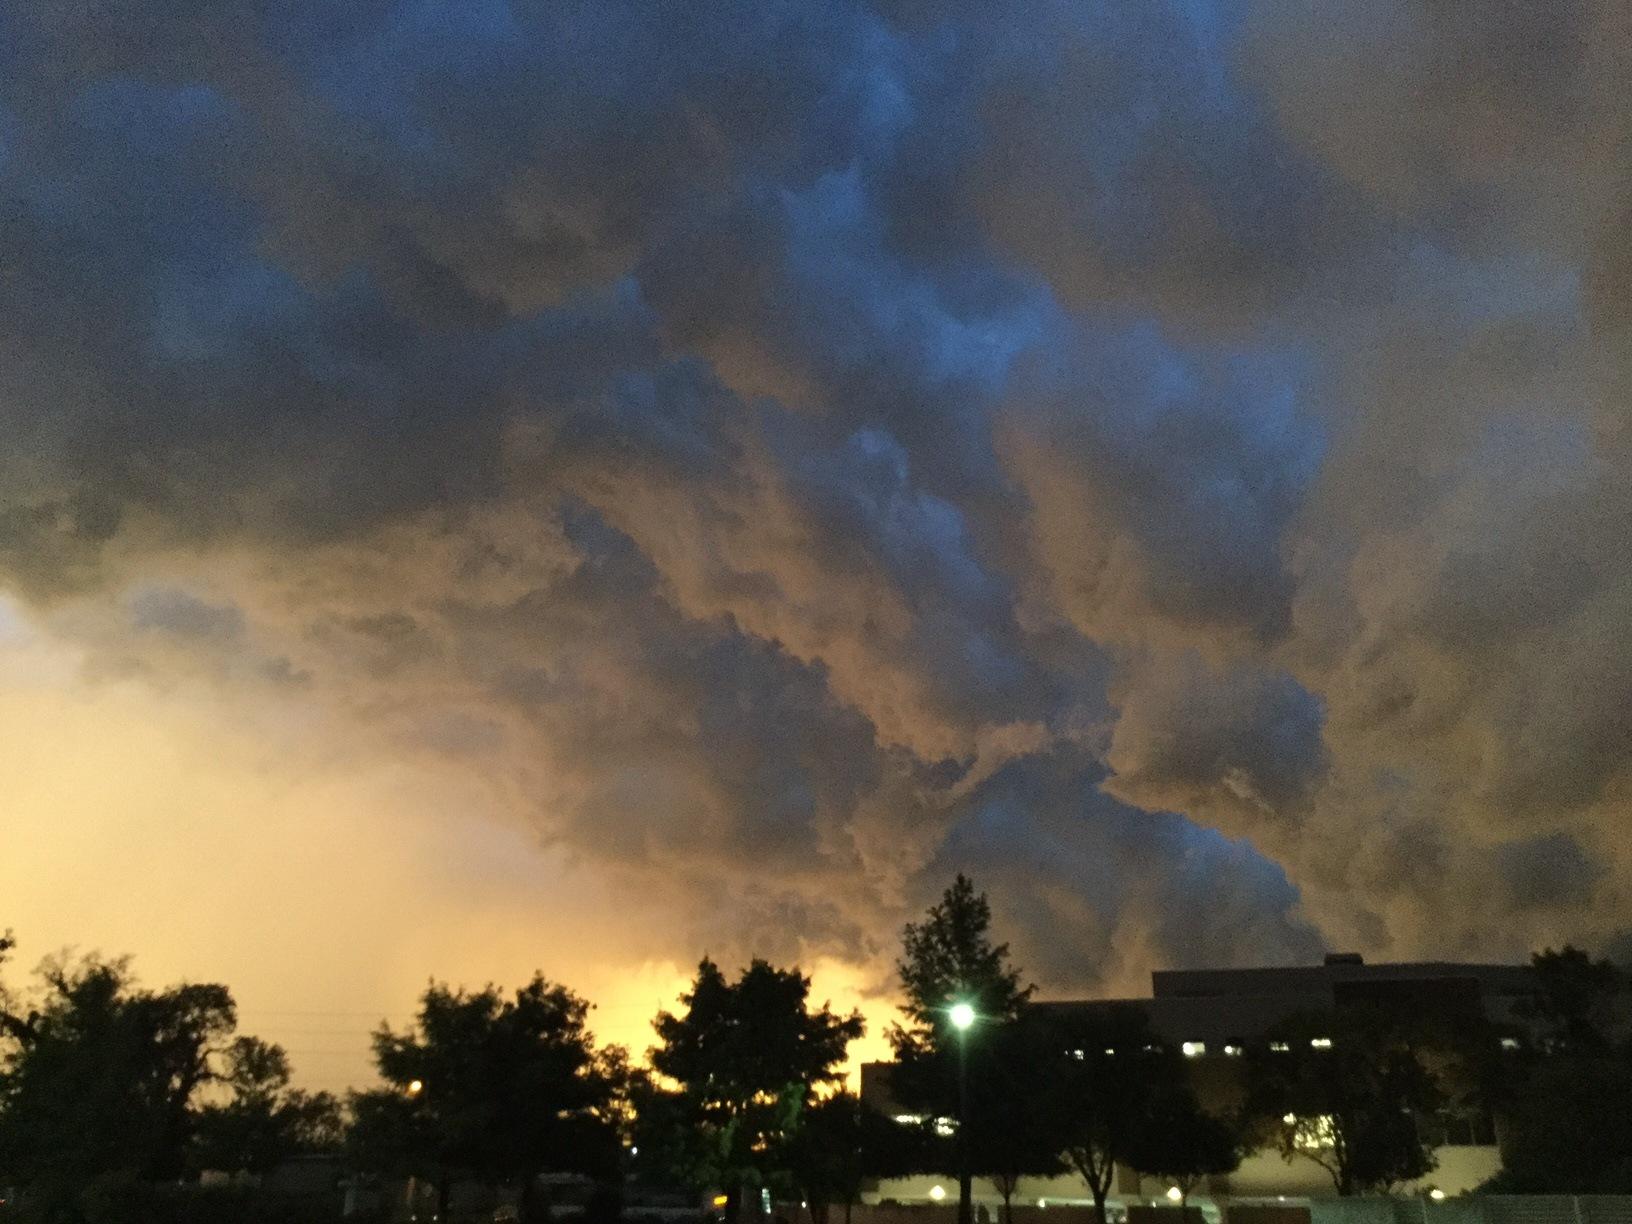 Kansas thunderstorm by Todd Smith